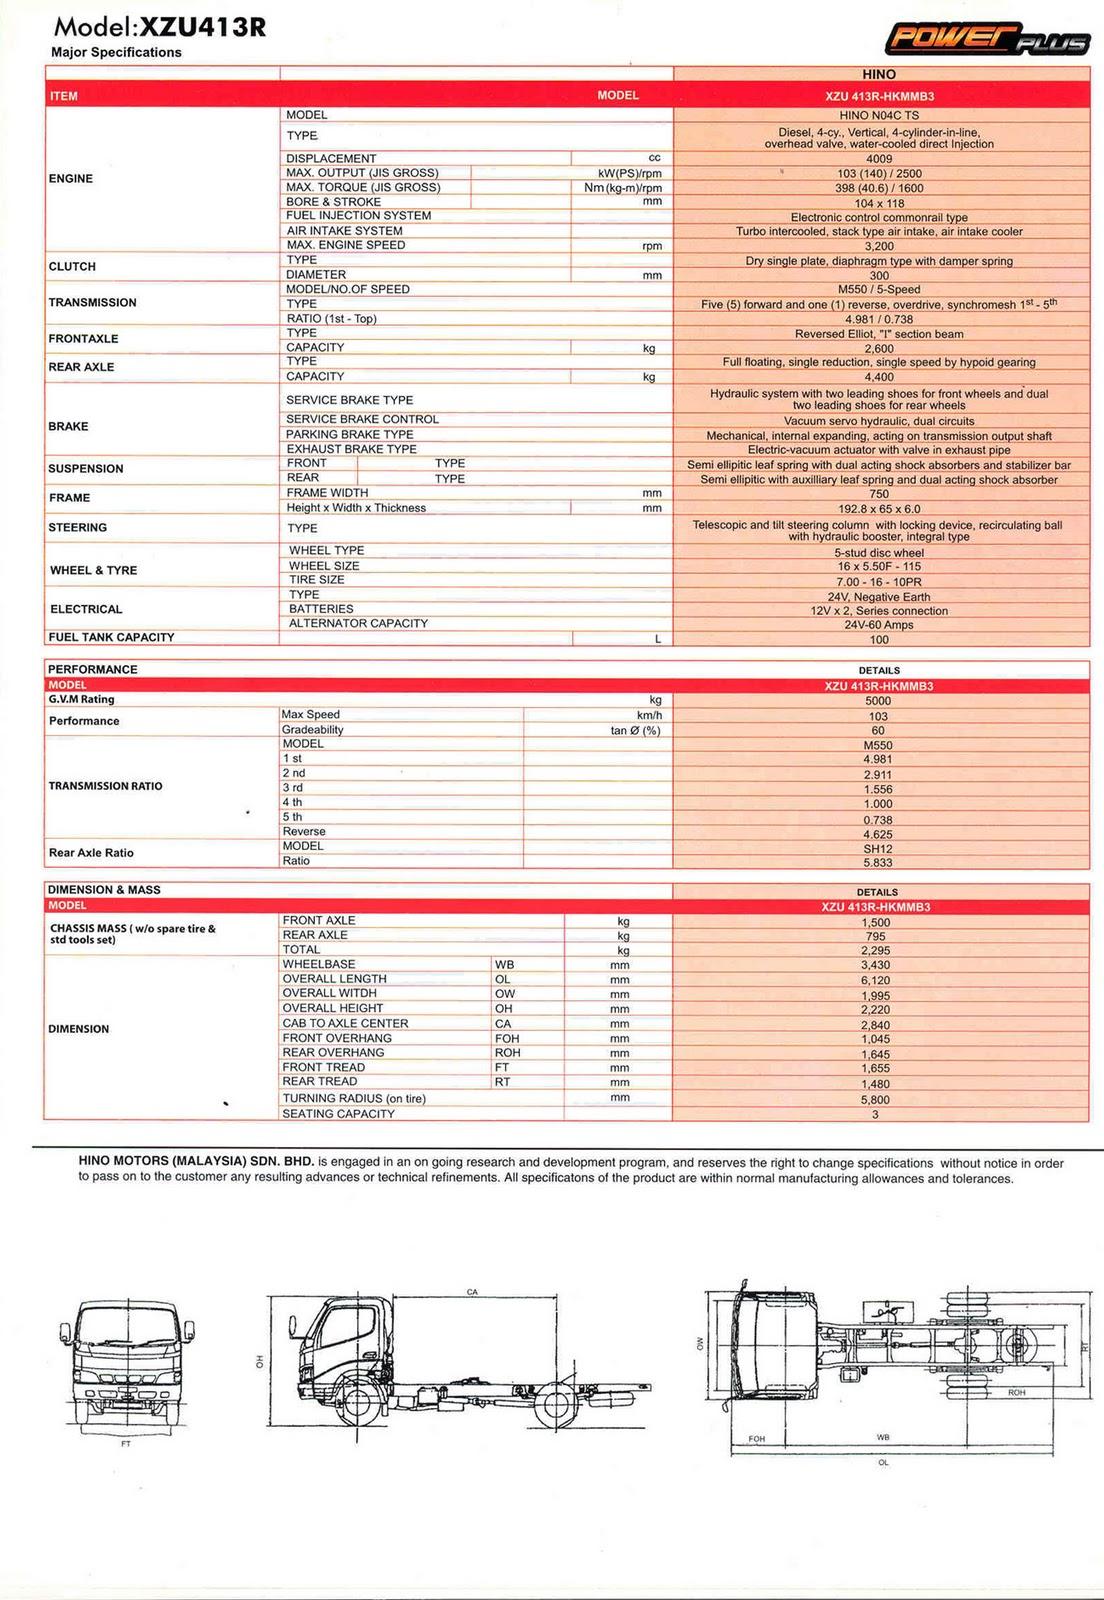 Regas Group of Companies: HINO XZU413R SPECS & FEATURES